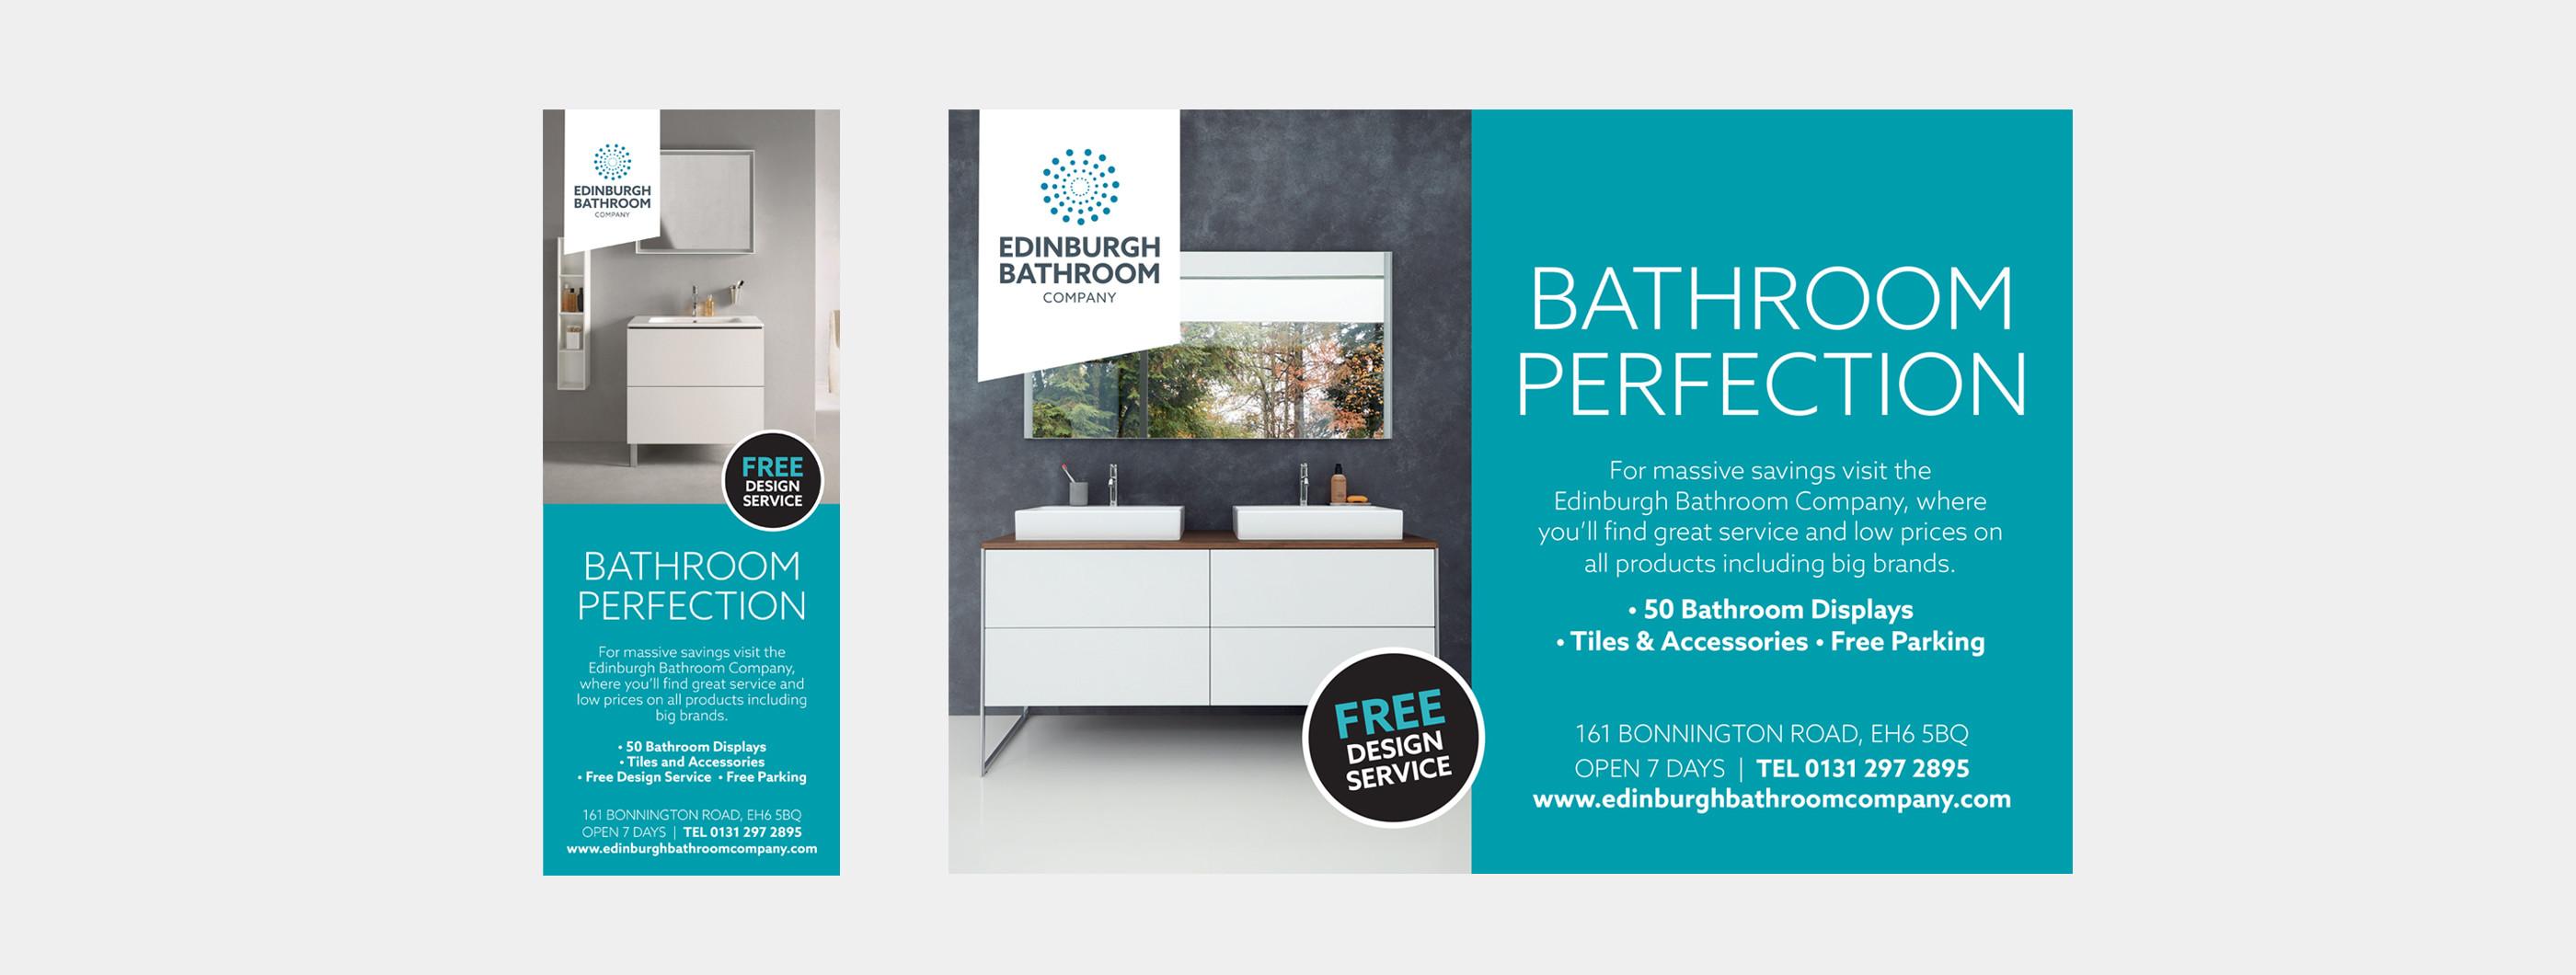 Edinburgh Bathroom Company